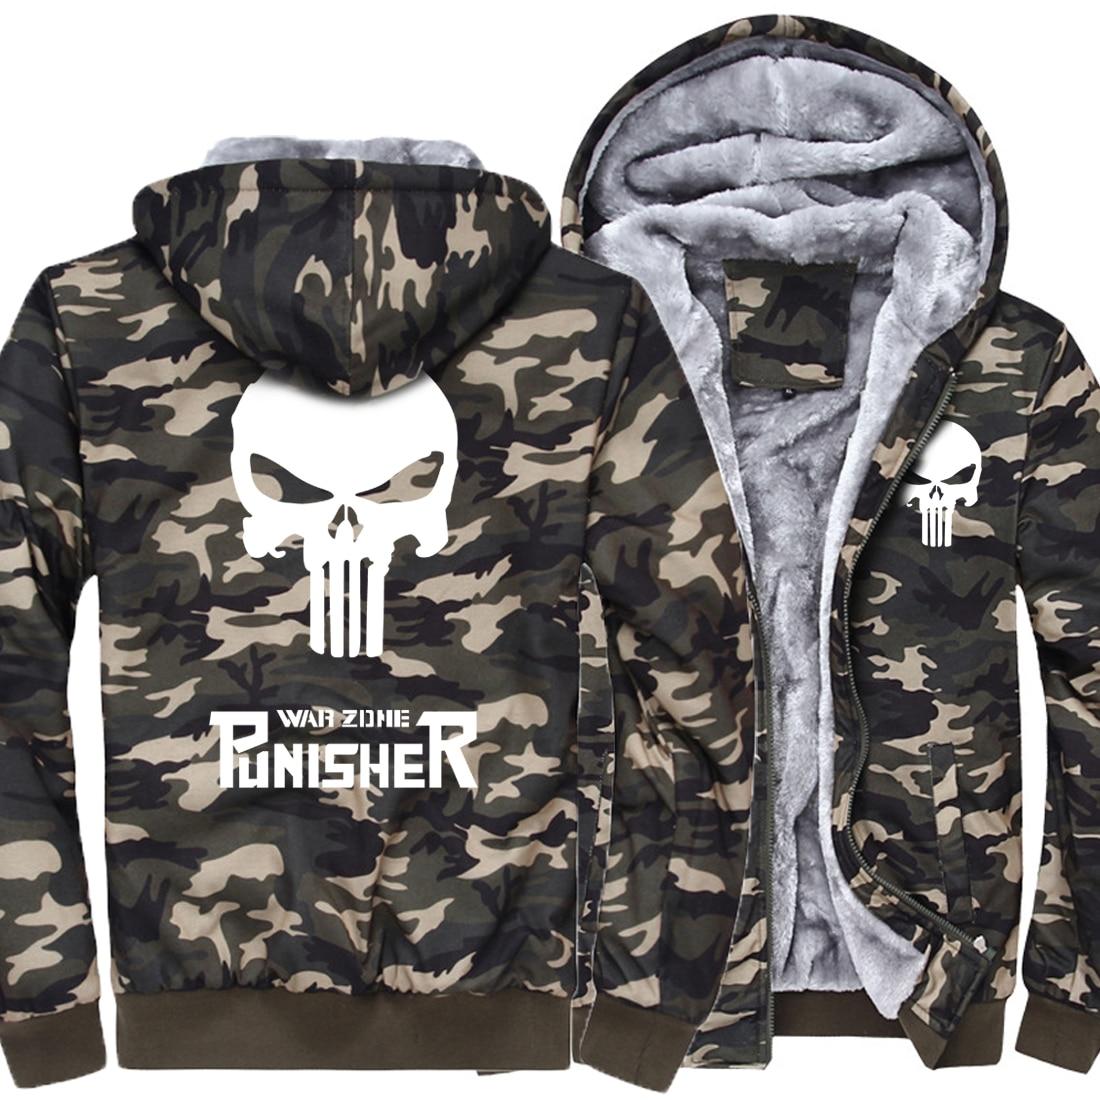 2019 Mens Fashion Brand High Quality Sweatshirts Camouflage Thick Hoody Print harajuku Skull Punk Hip Hop Fitness Hoodies men